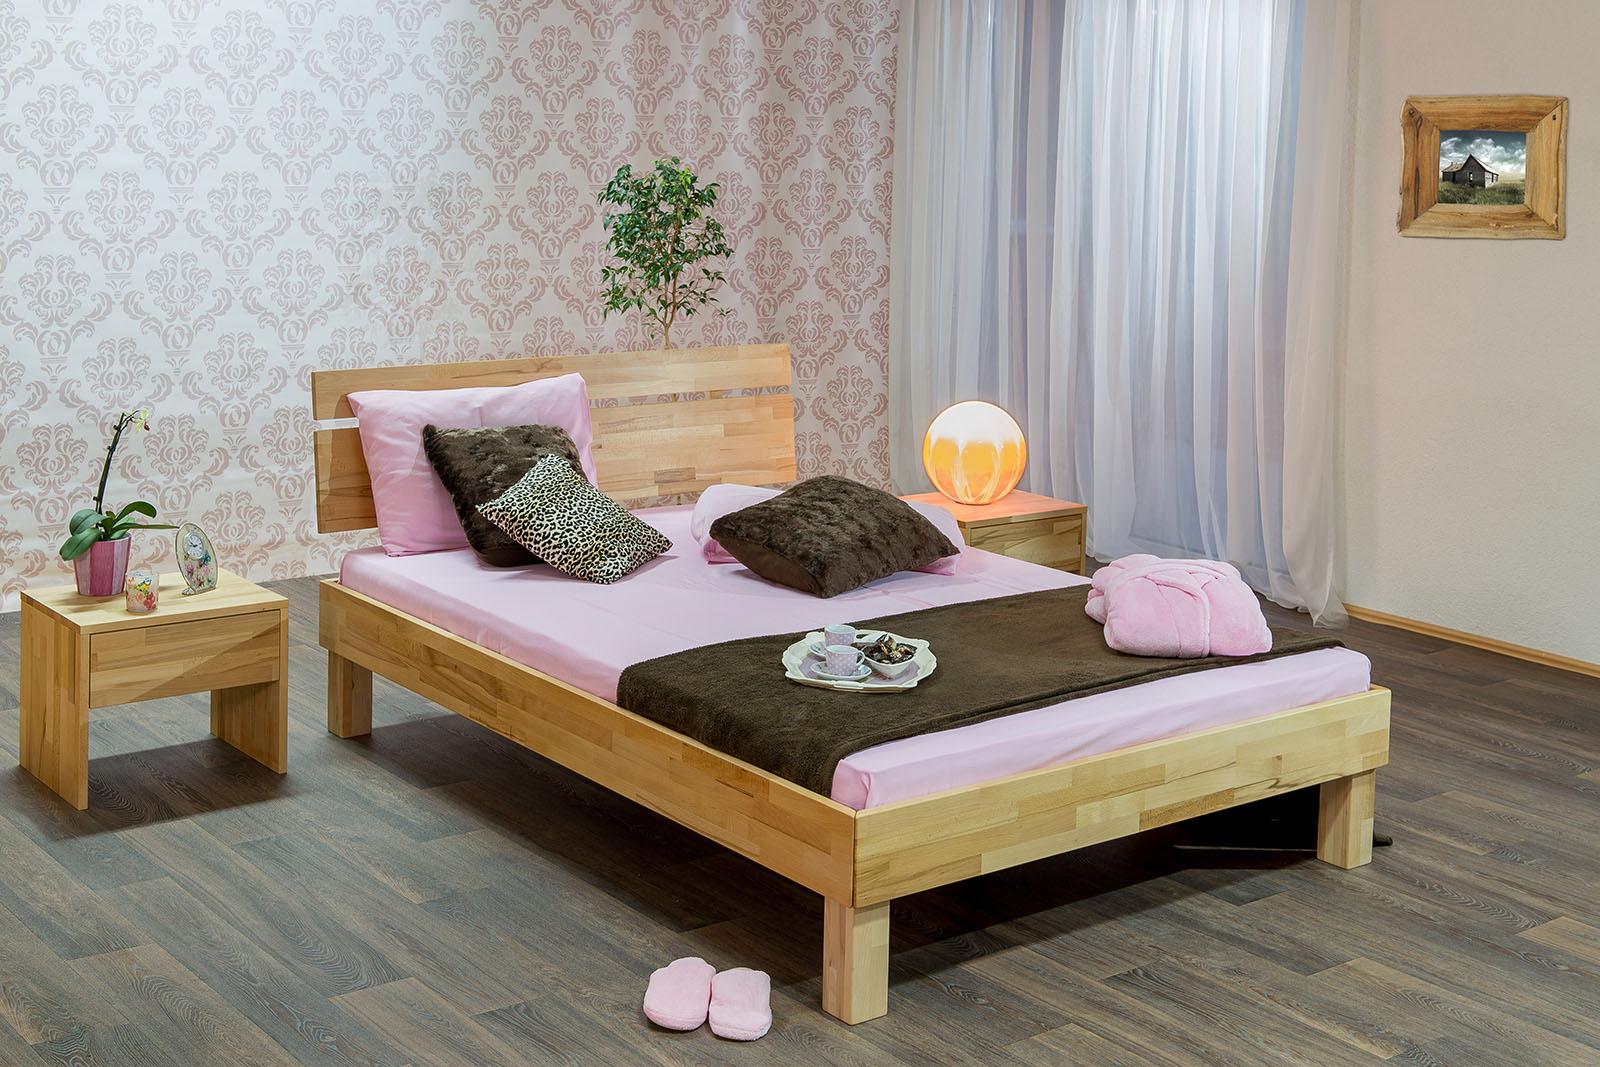 Massivholzbett Schlafzimmerbett SORIN Bett Kernbuche 140x200